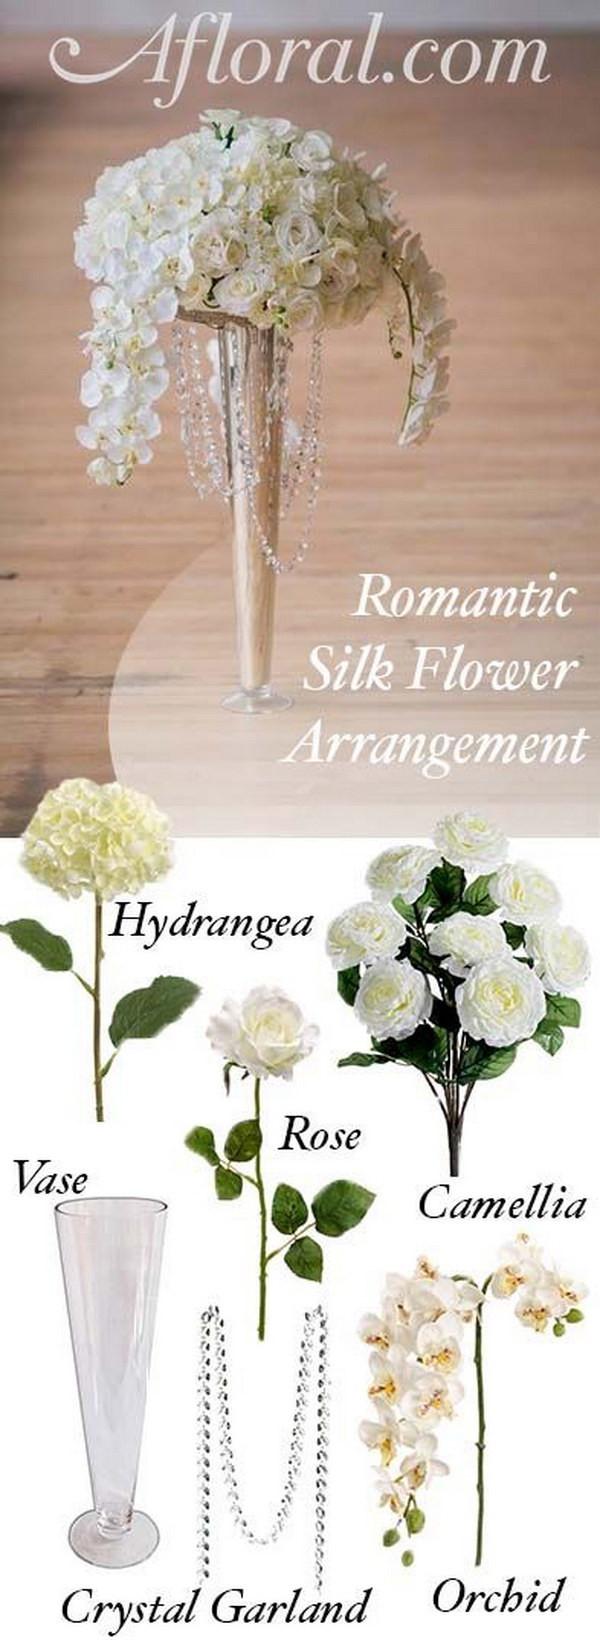 Best ideas about DIY Tall Wedding Centerpiece . Save or Pin Awesome DIY Wedding Centerpiece Ideas & Tutorials Now.